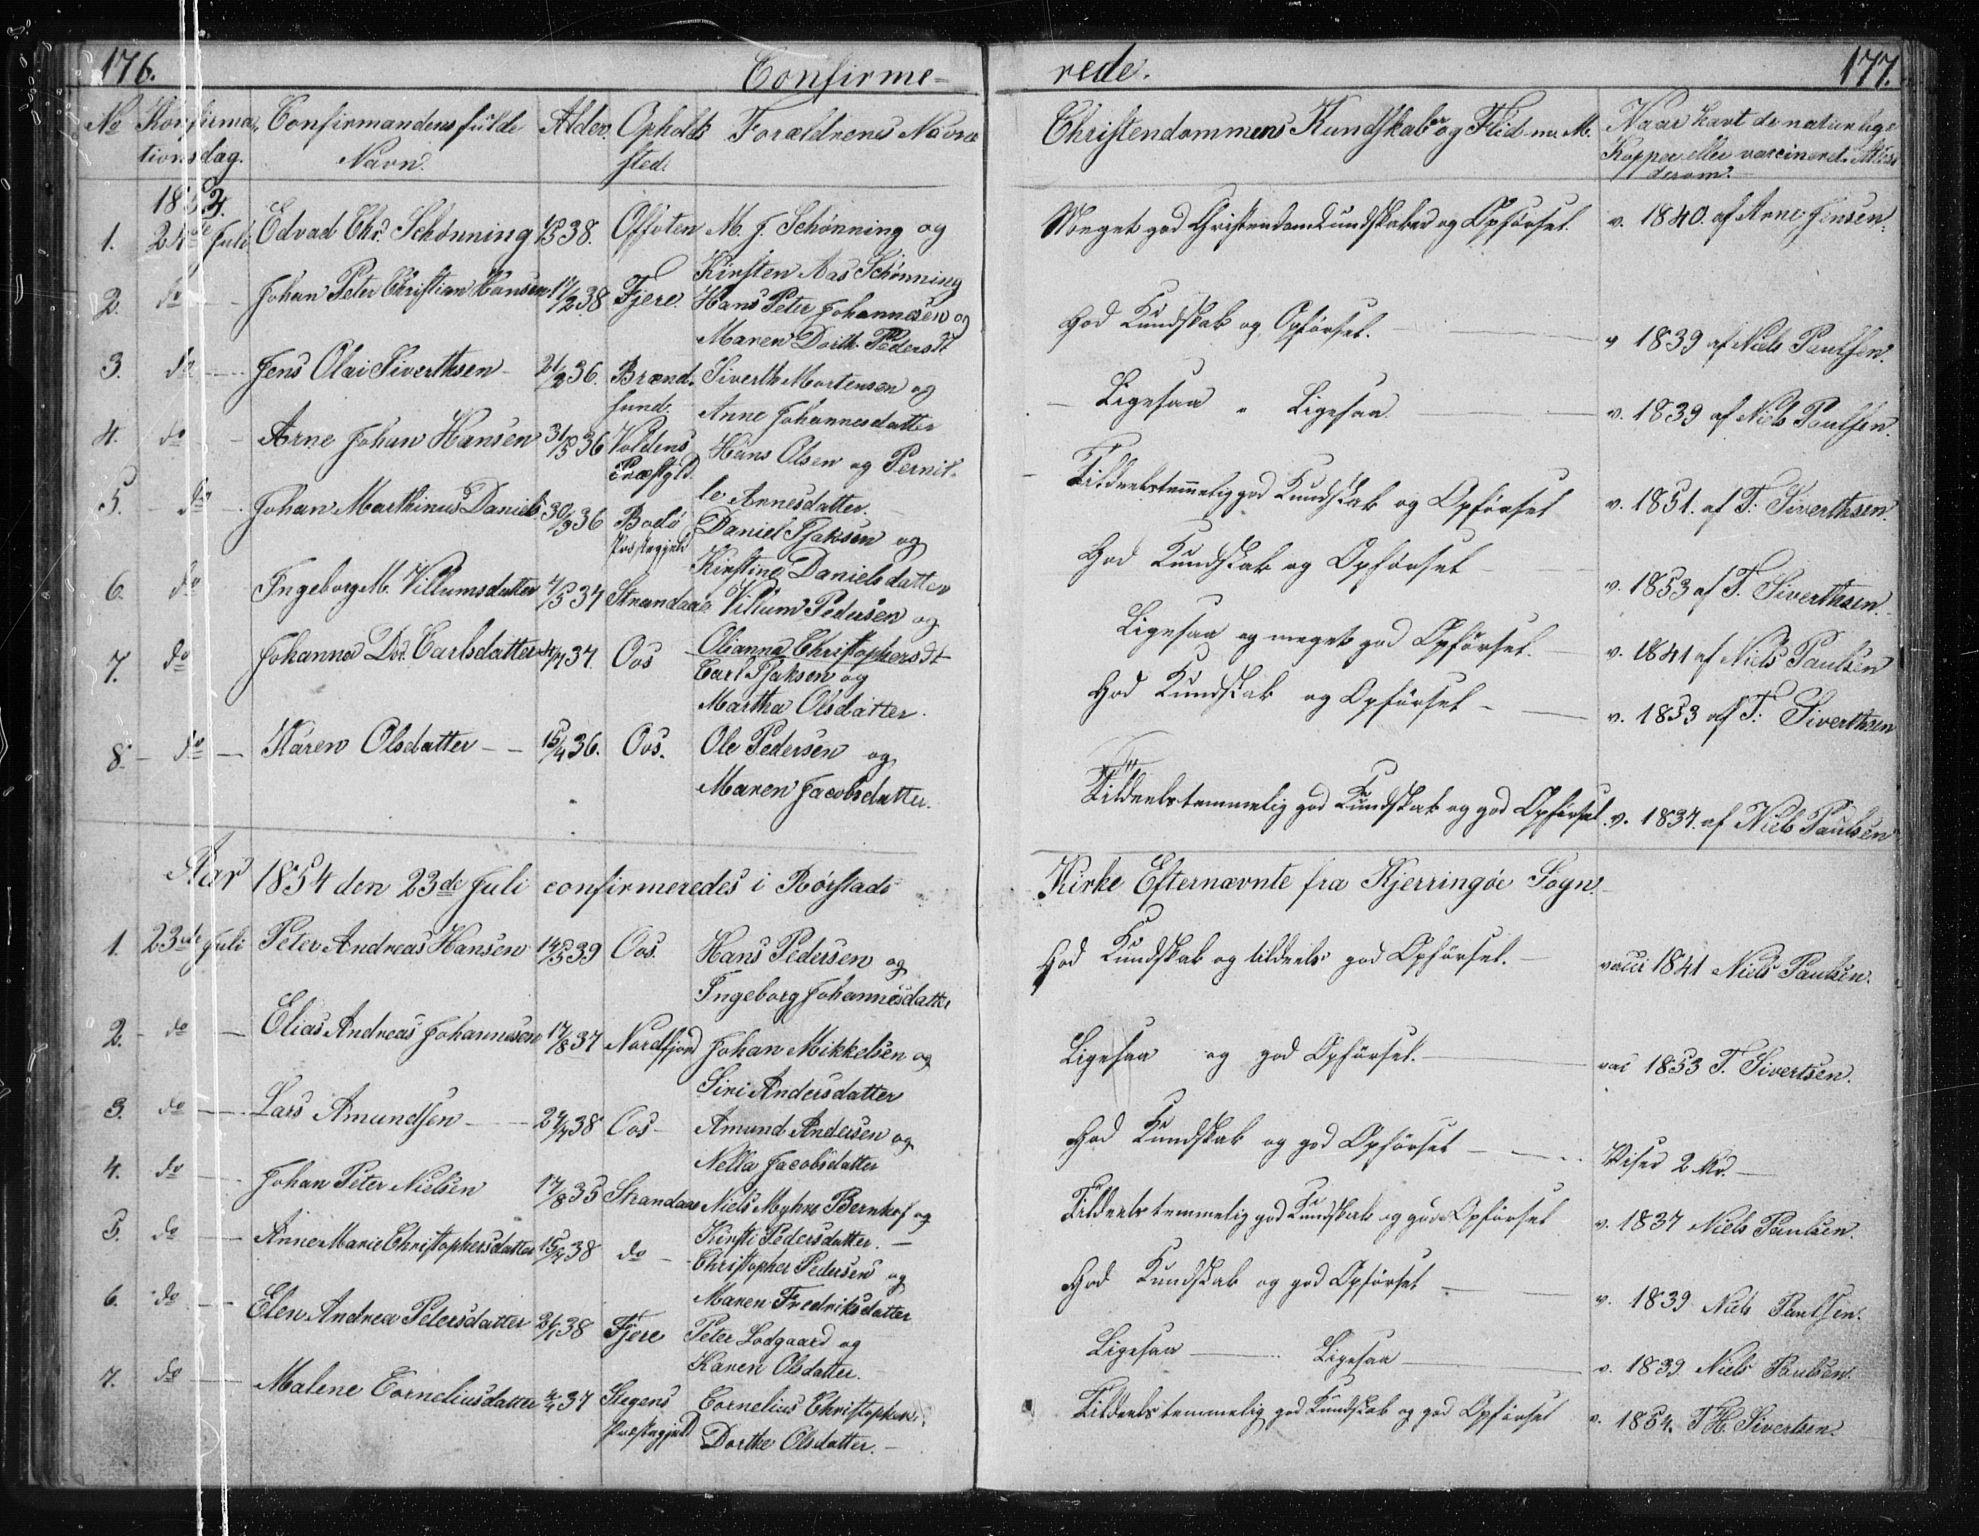 SAT, Ministerialprotokoller, klokkerbøker og fødselsregistre - Nordland, 803/L0074: Klokkerbok nr. 803C01, 1845-1866, s. 176-177